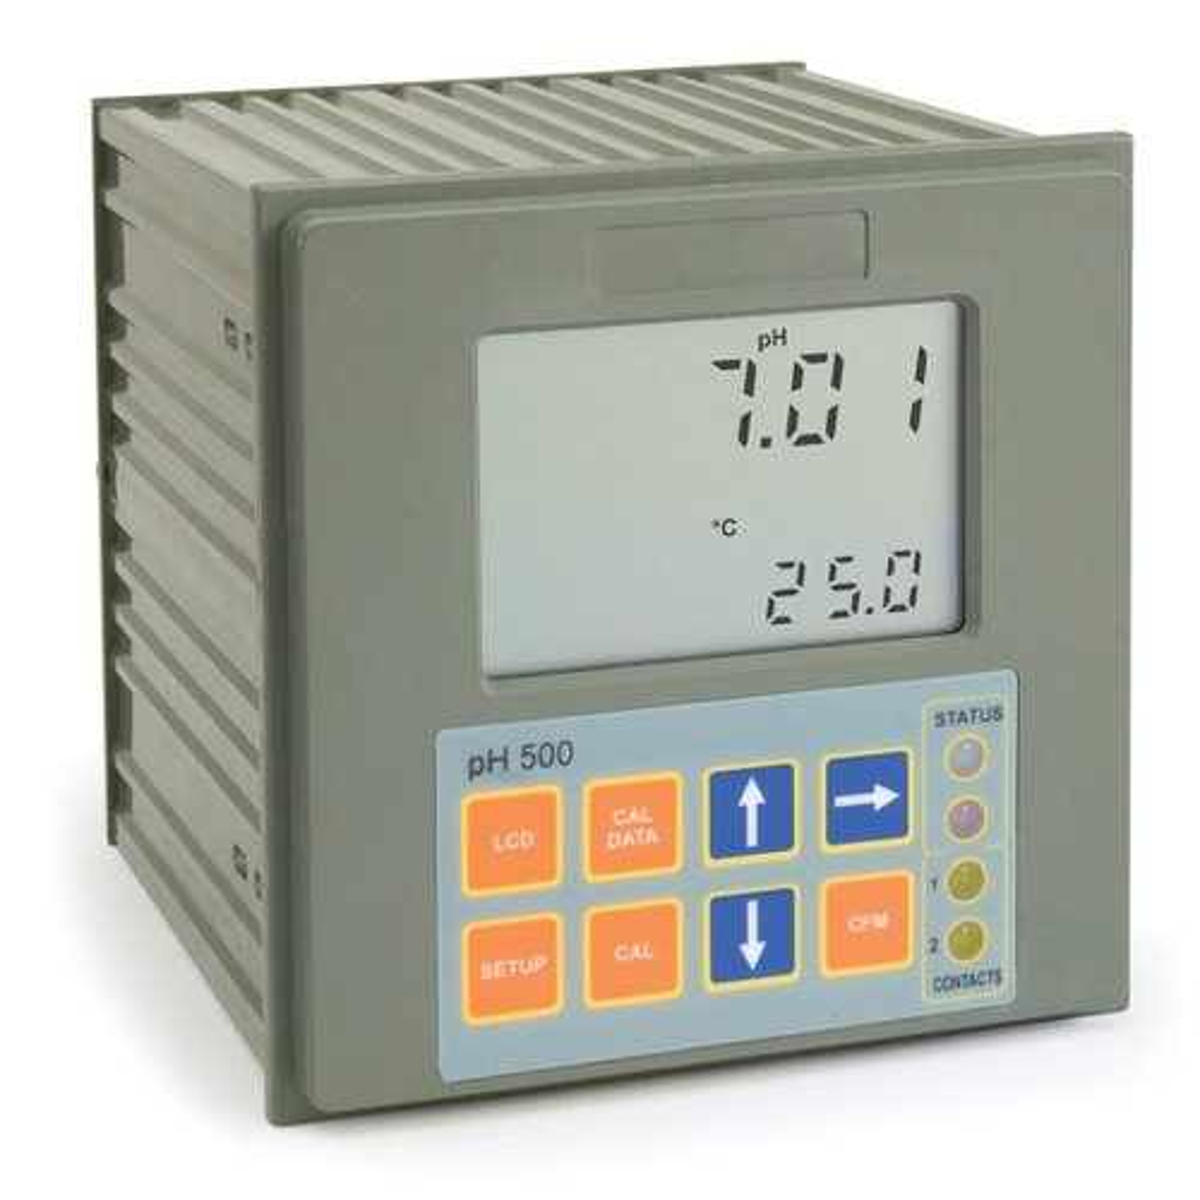 Panel-mounted pH Digital Controller with Matching Pin - pH500 series